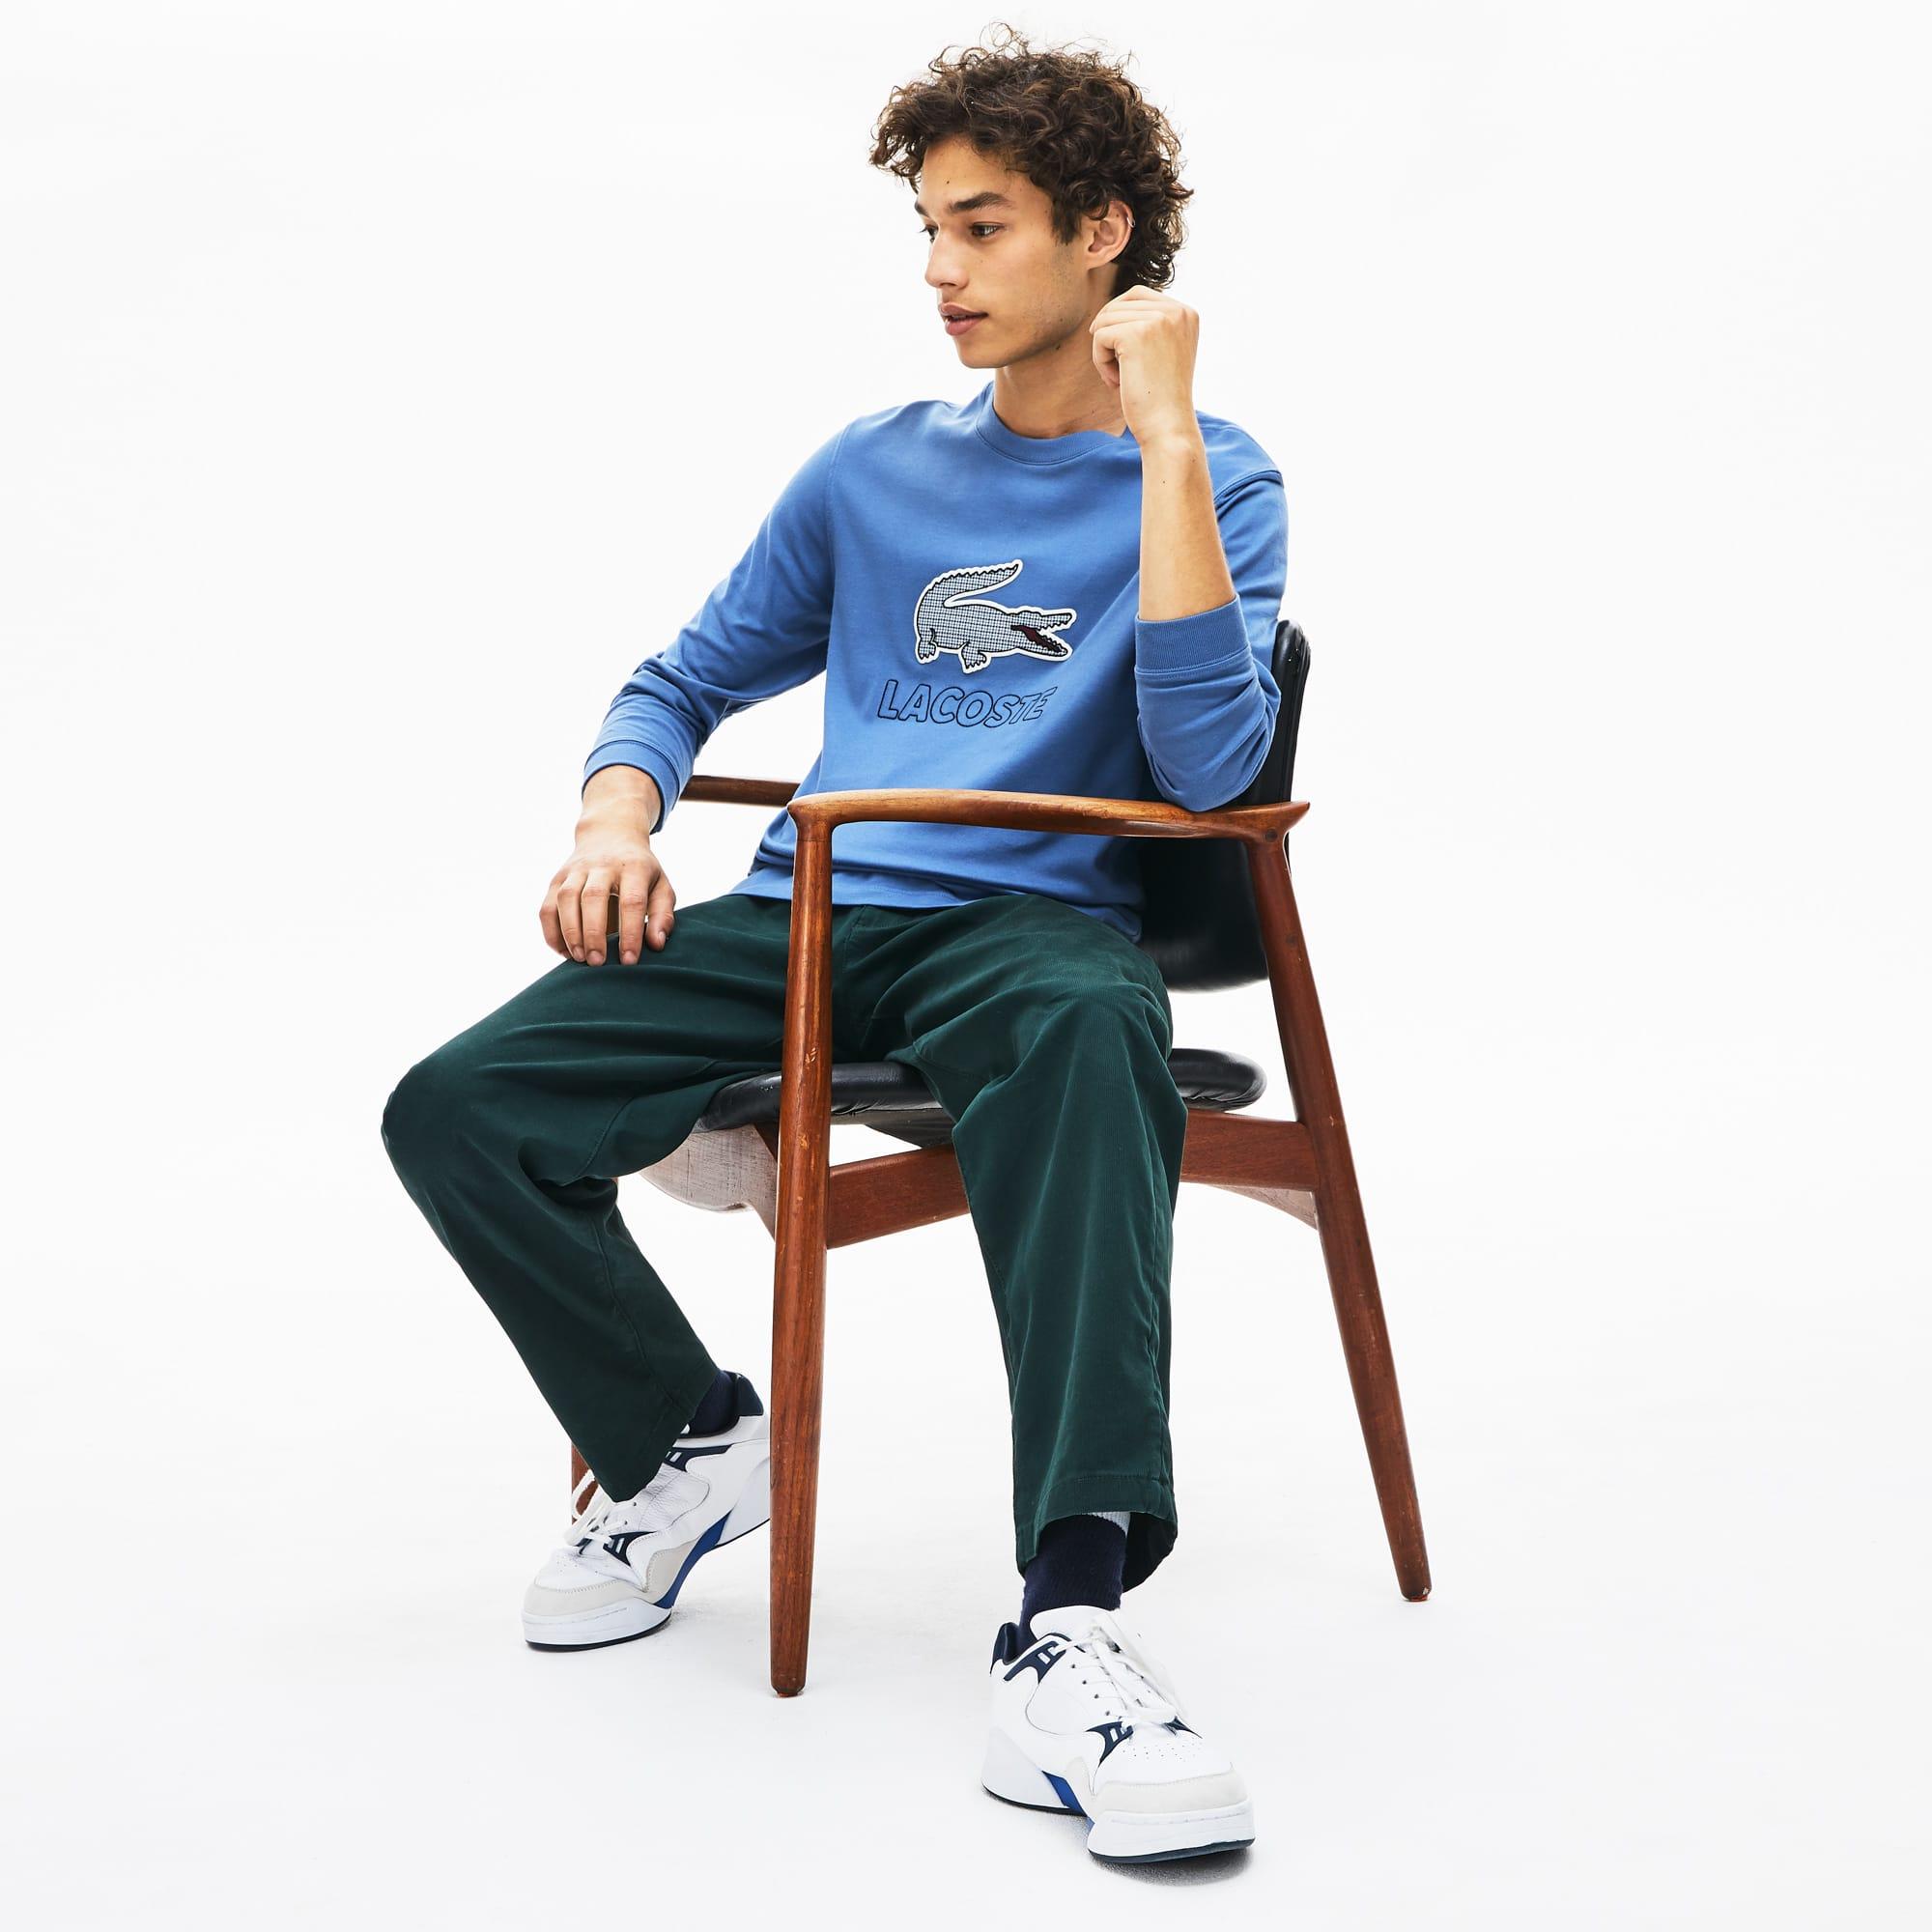 Lacoste Tops Men's Oversized Checkered-Logo Cotton T-Shirt